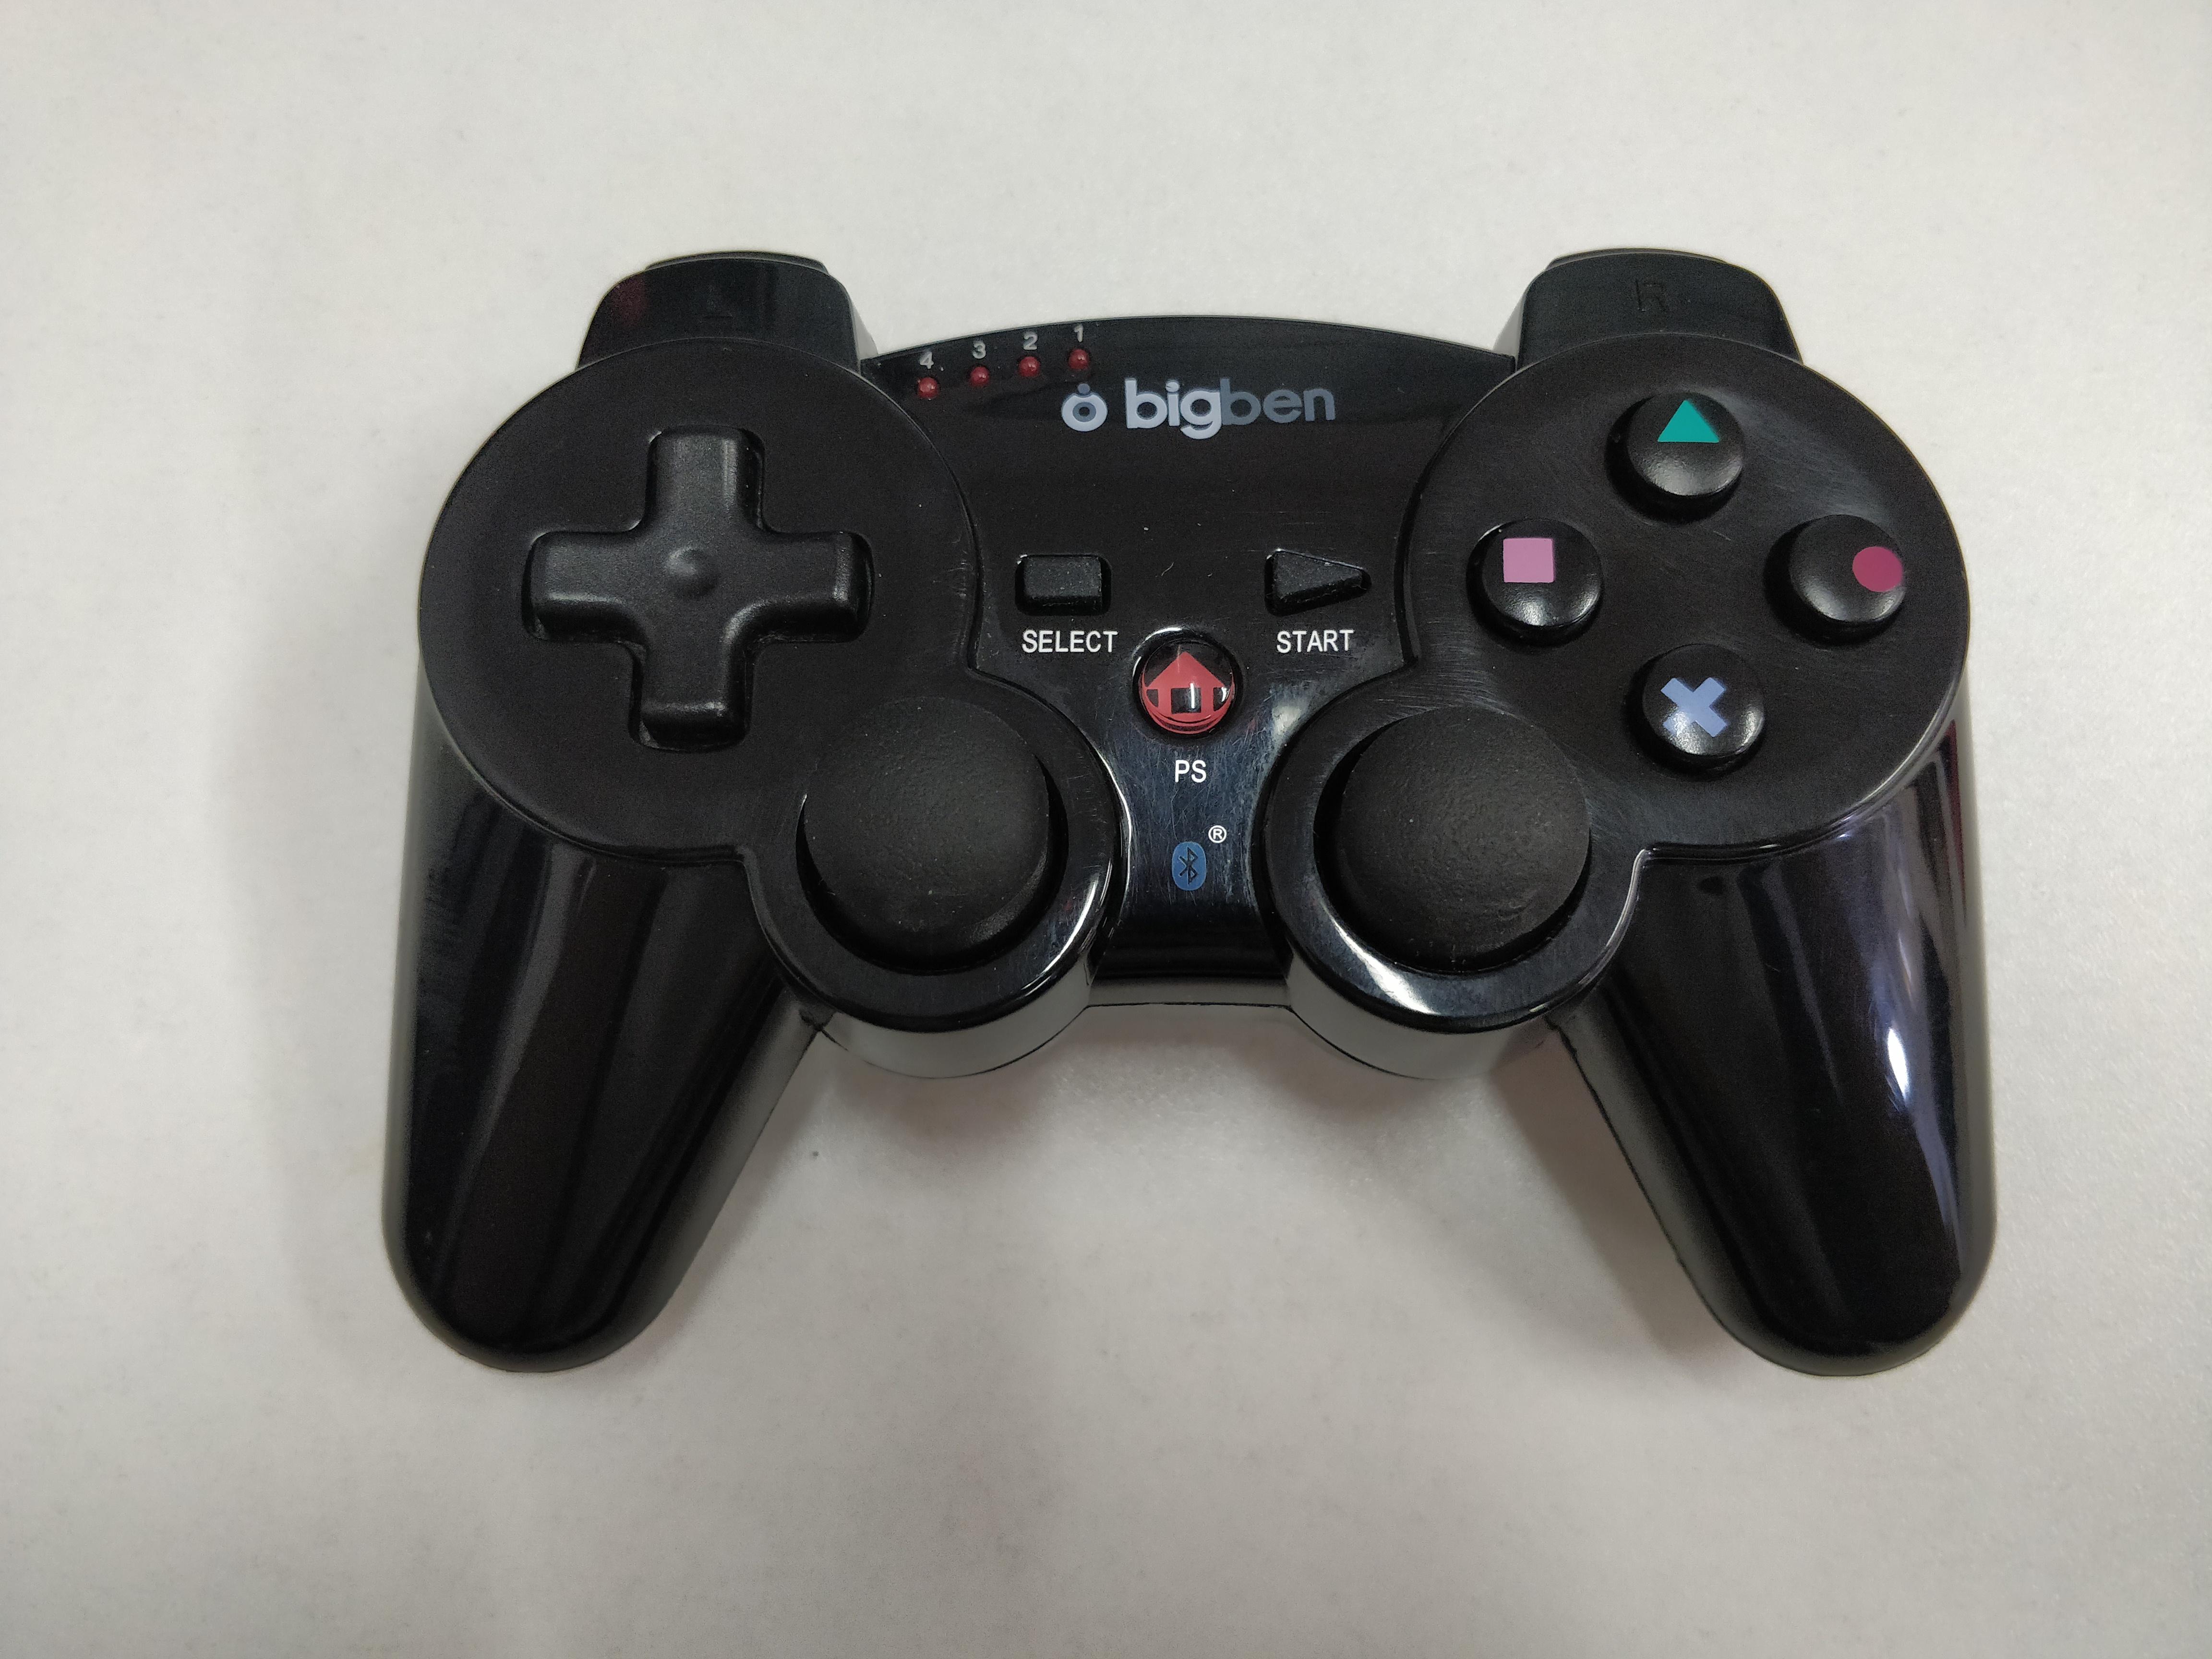 [PS3] Bezdrátový Ovladač BigBen - černý (estetická vada)